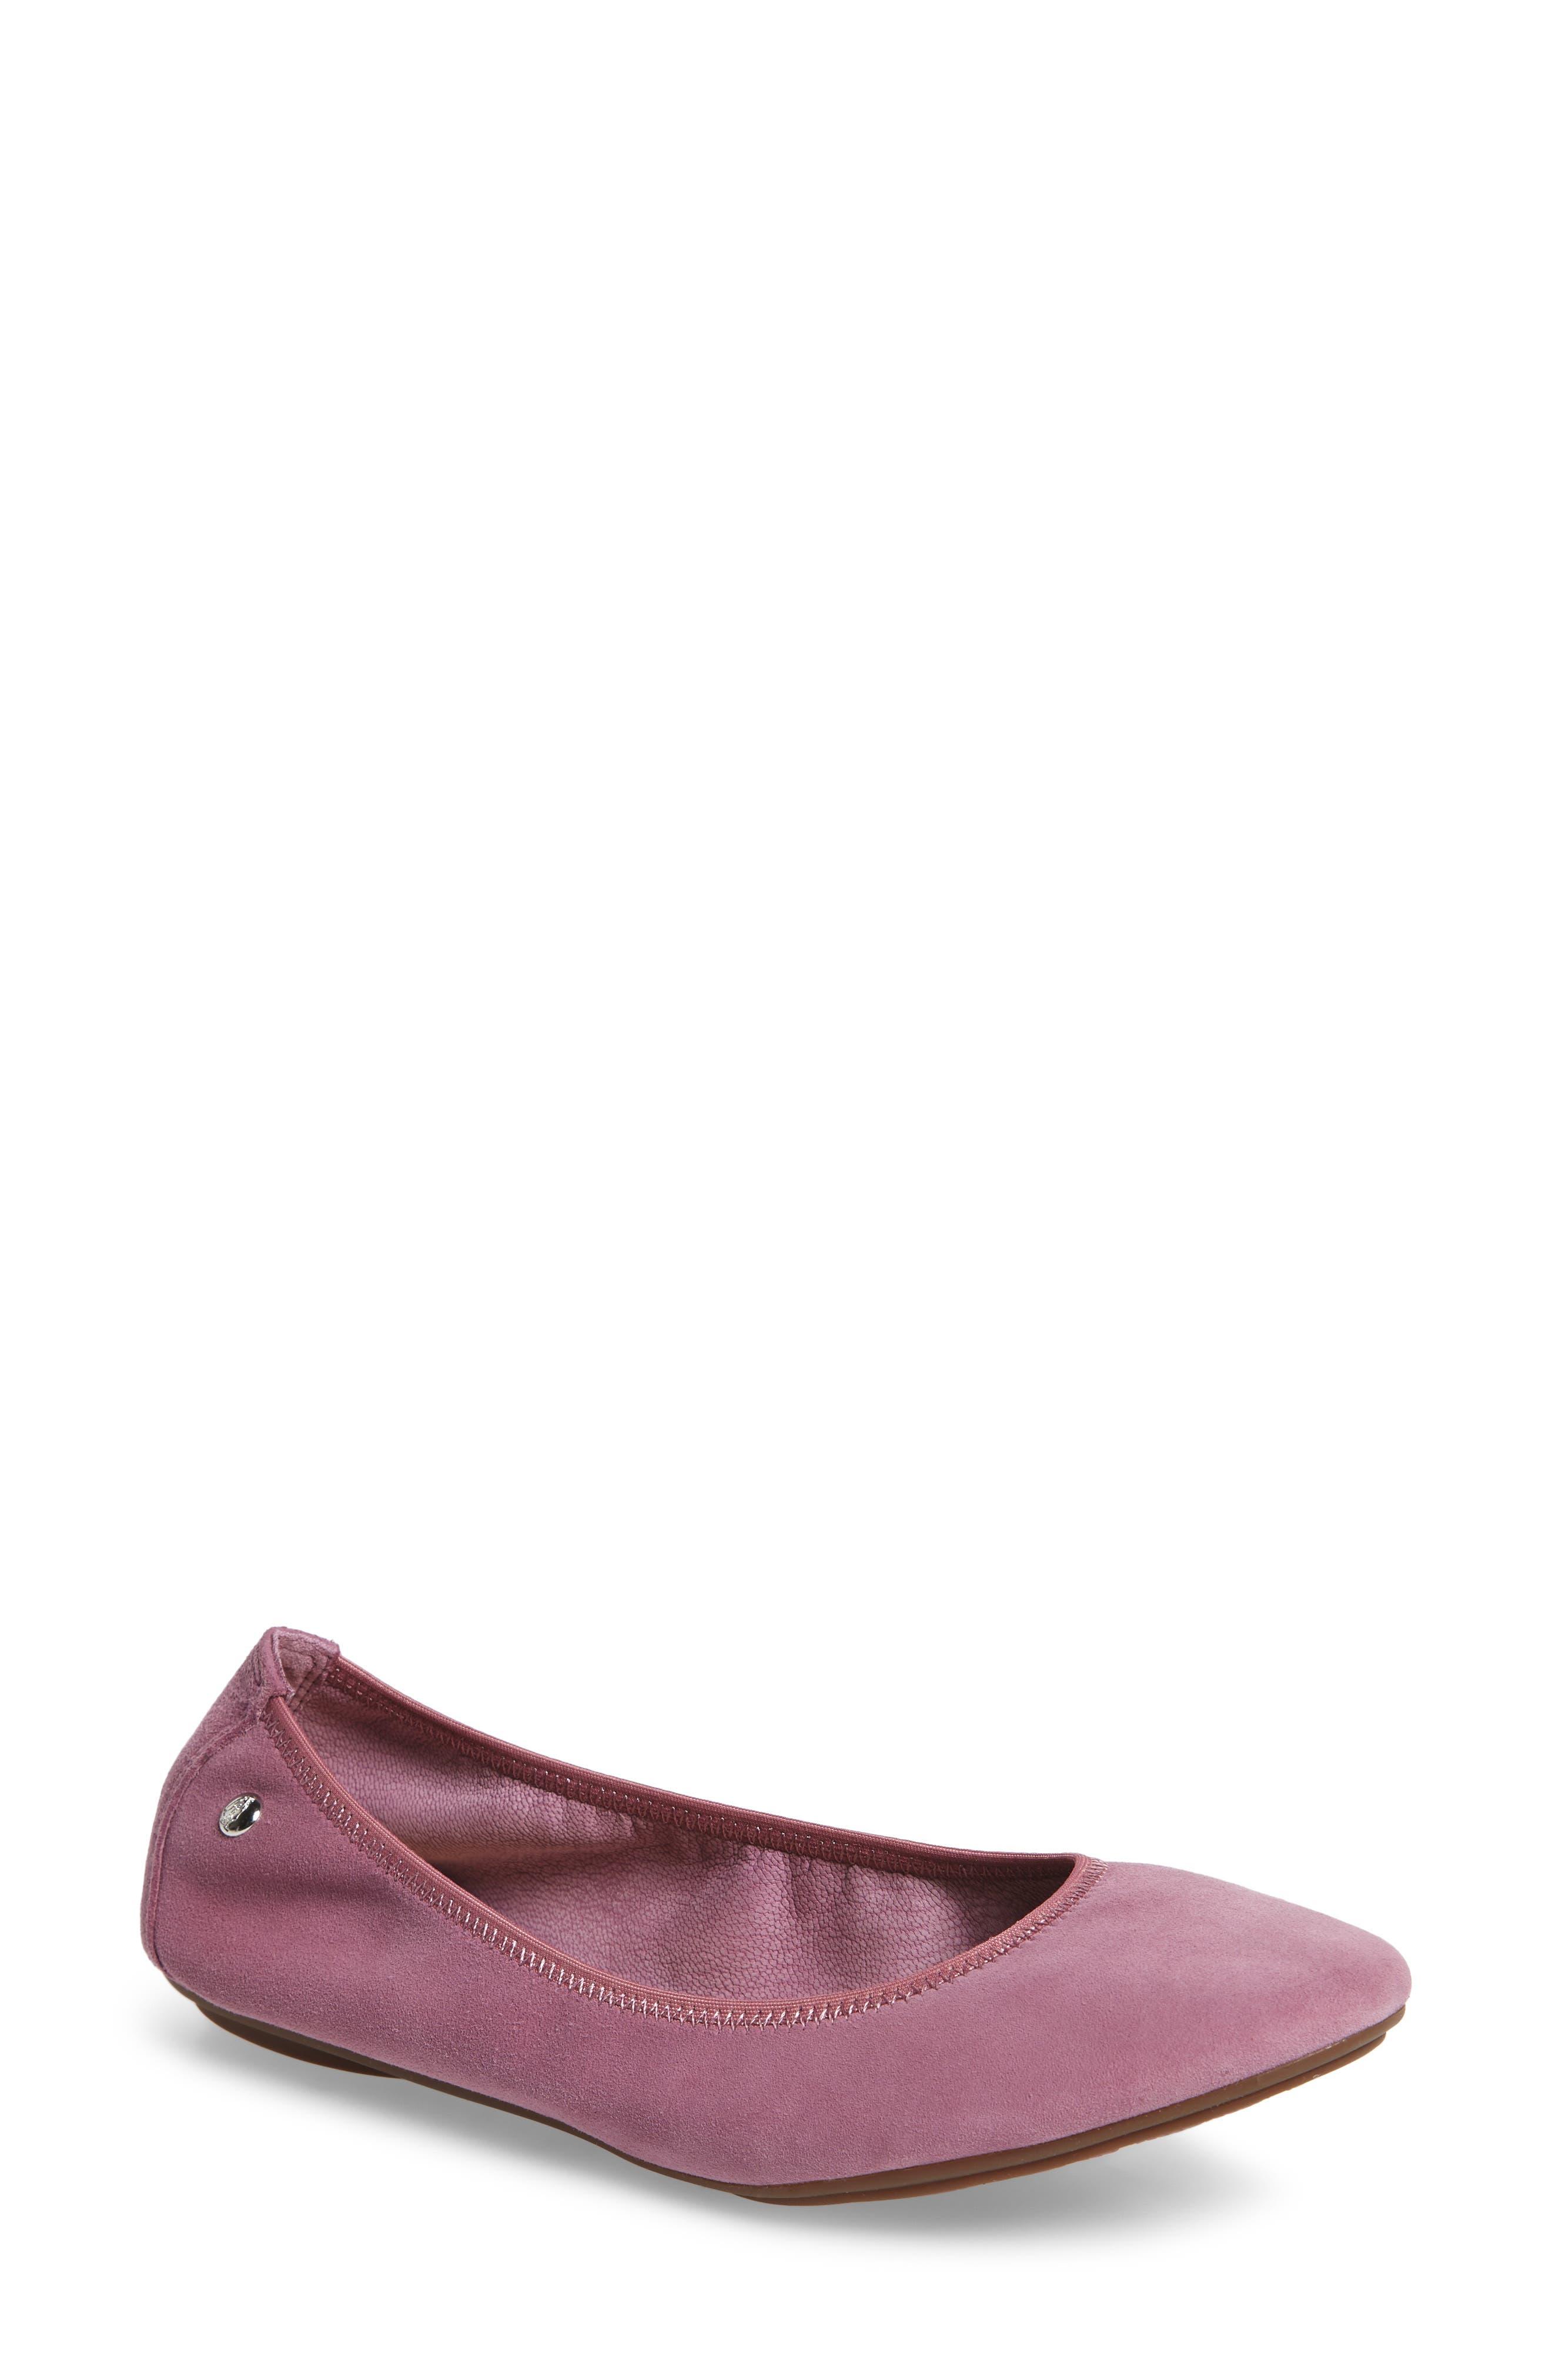 'Chaste' Ballet Flat,                             Main thumbnail 6, color,